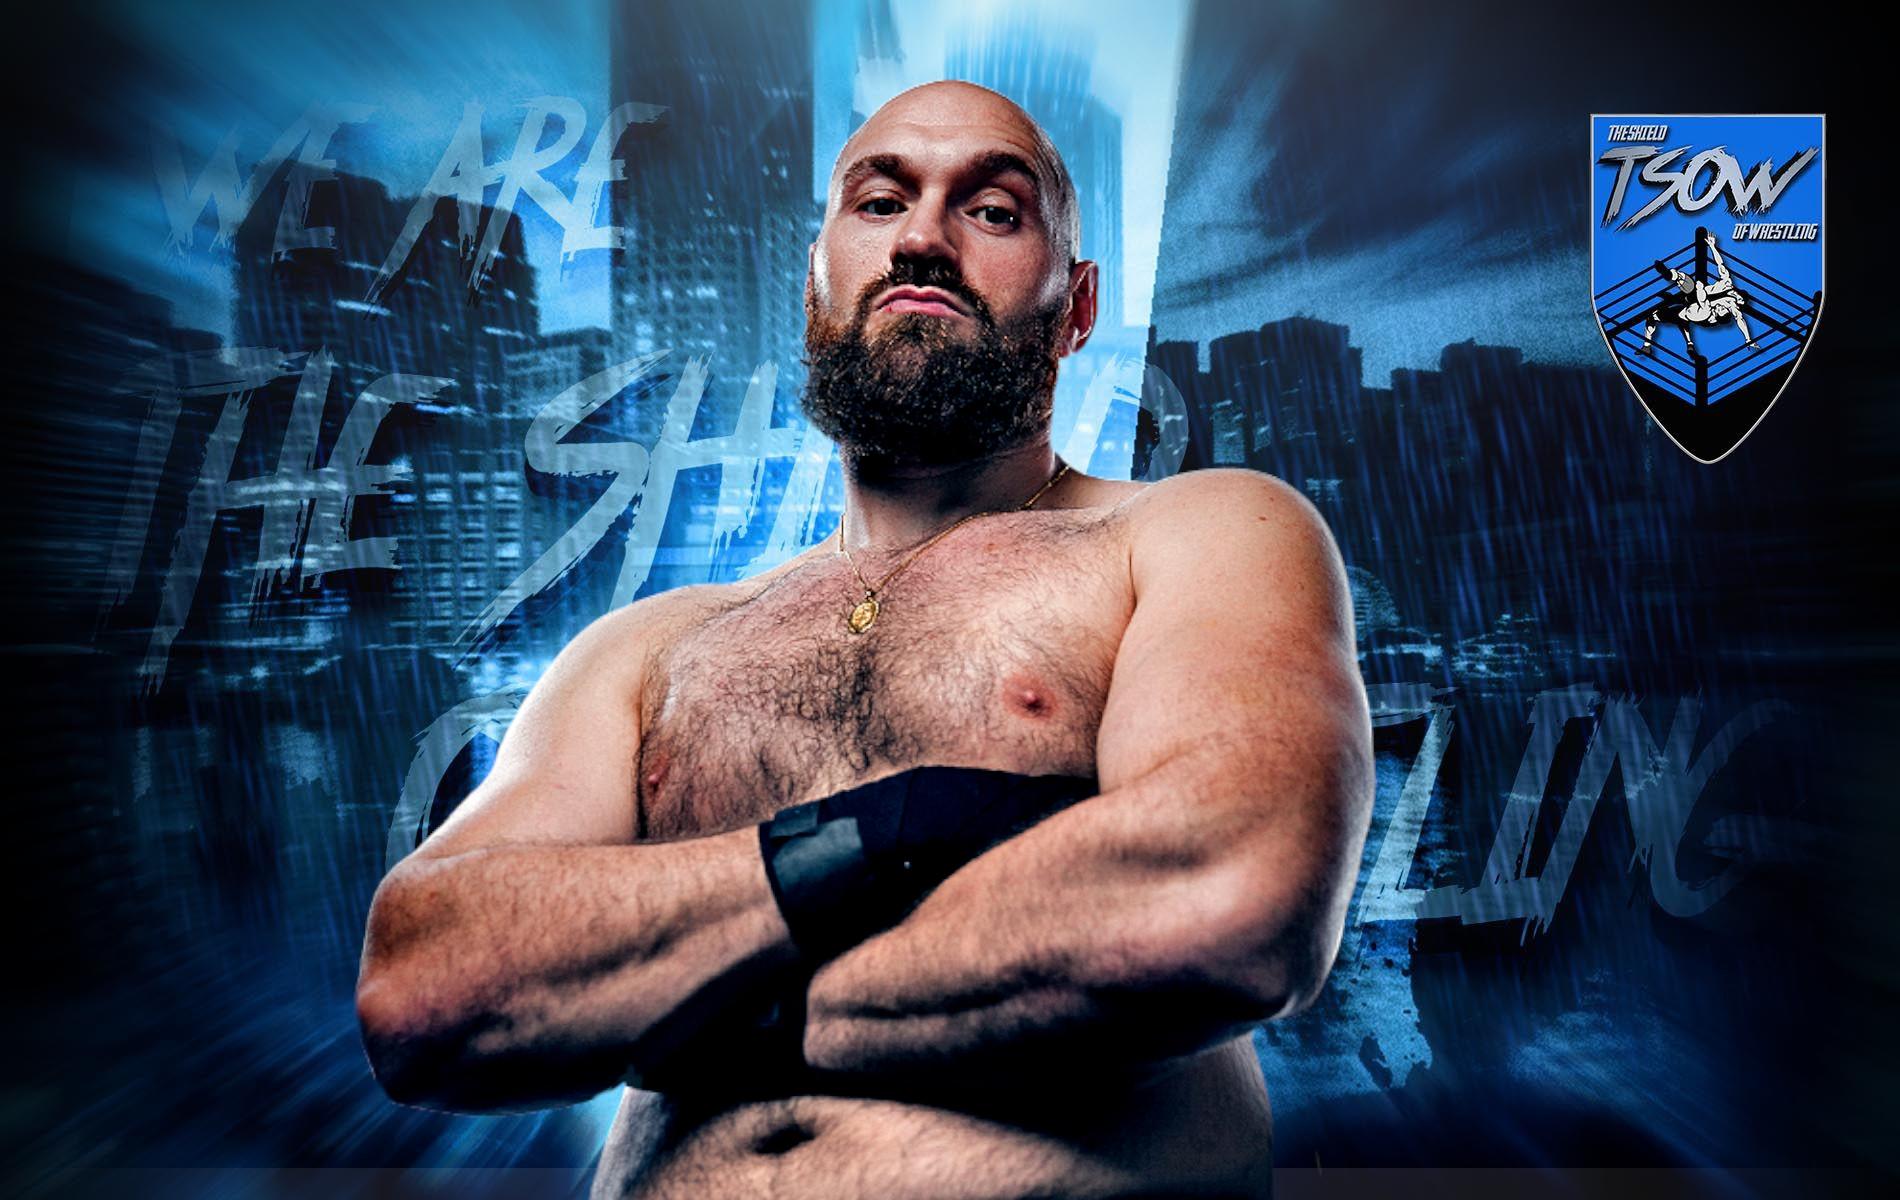 Tyson Fury era nel backstage di WrestleMania Backlash